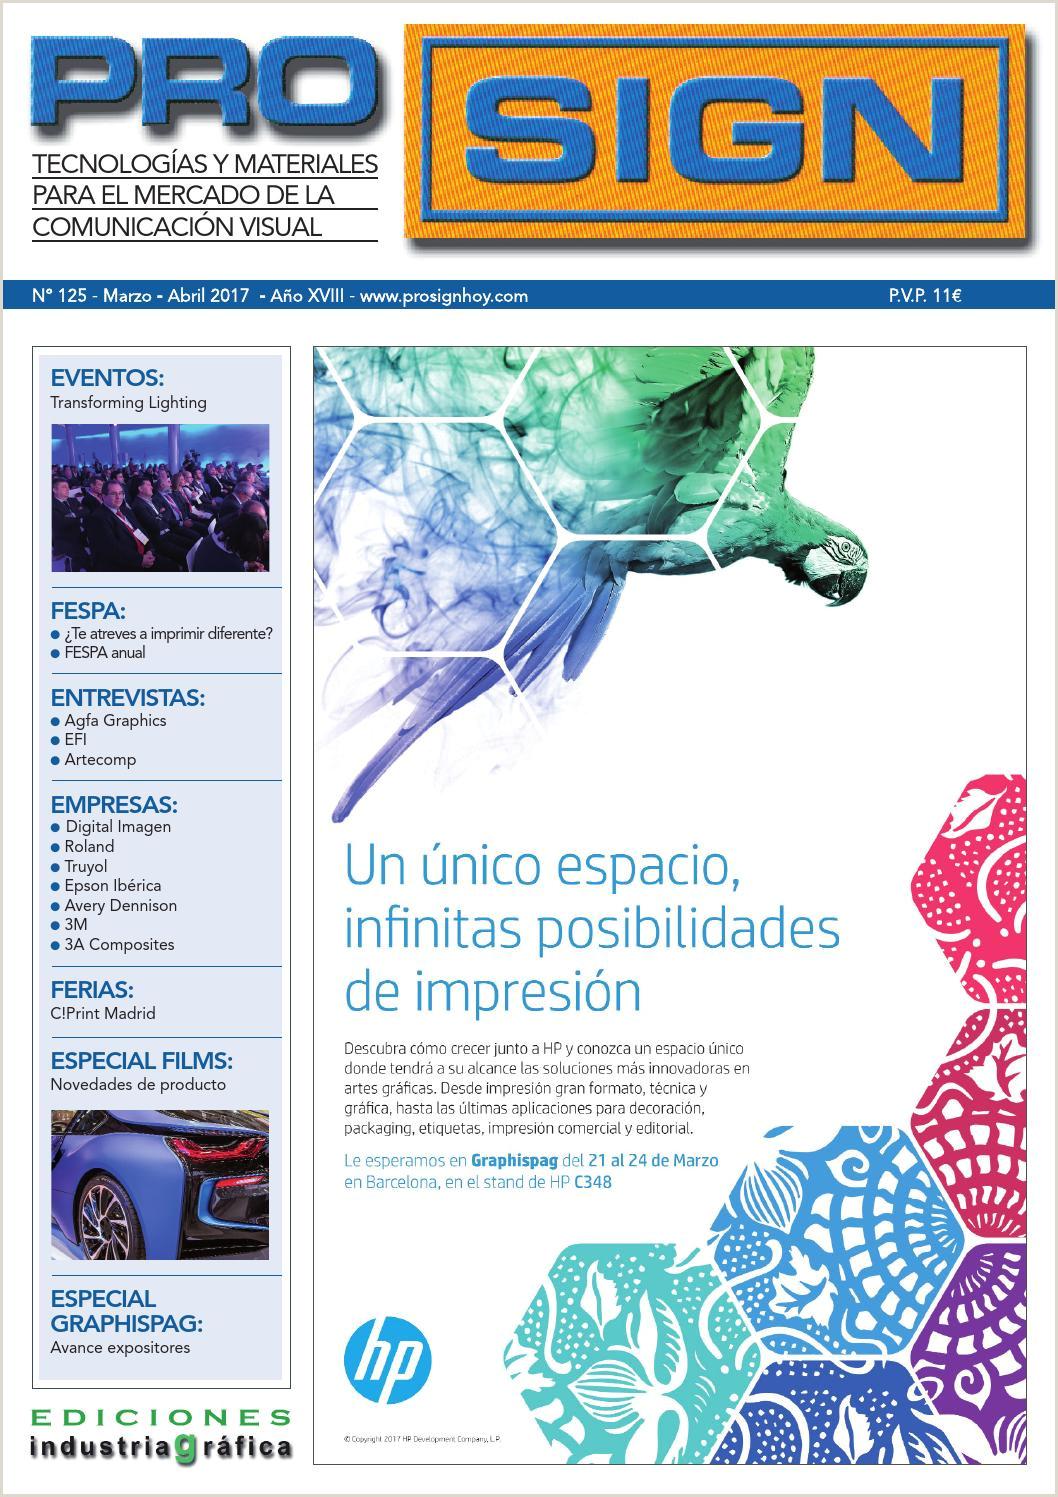 Formato Hoja De Vida Latex Prosign 125 Marzo Abril 2017 by Ediciones Industria